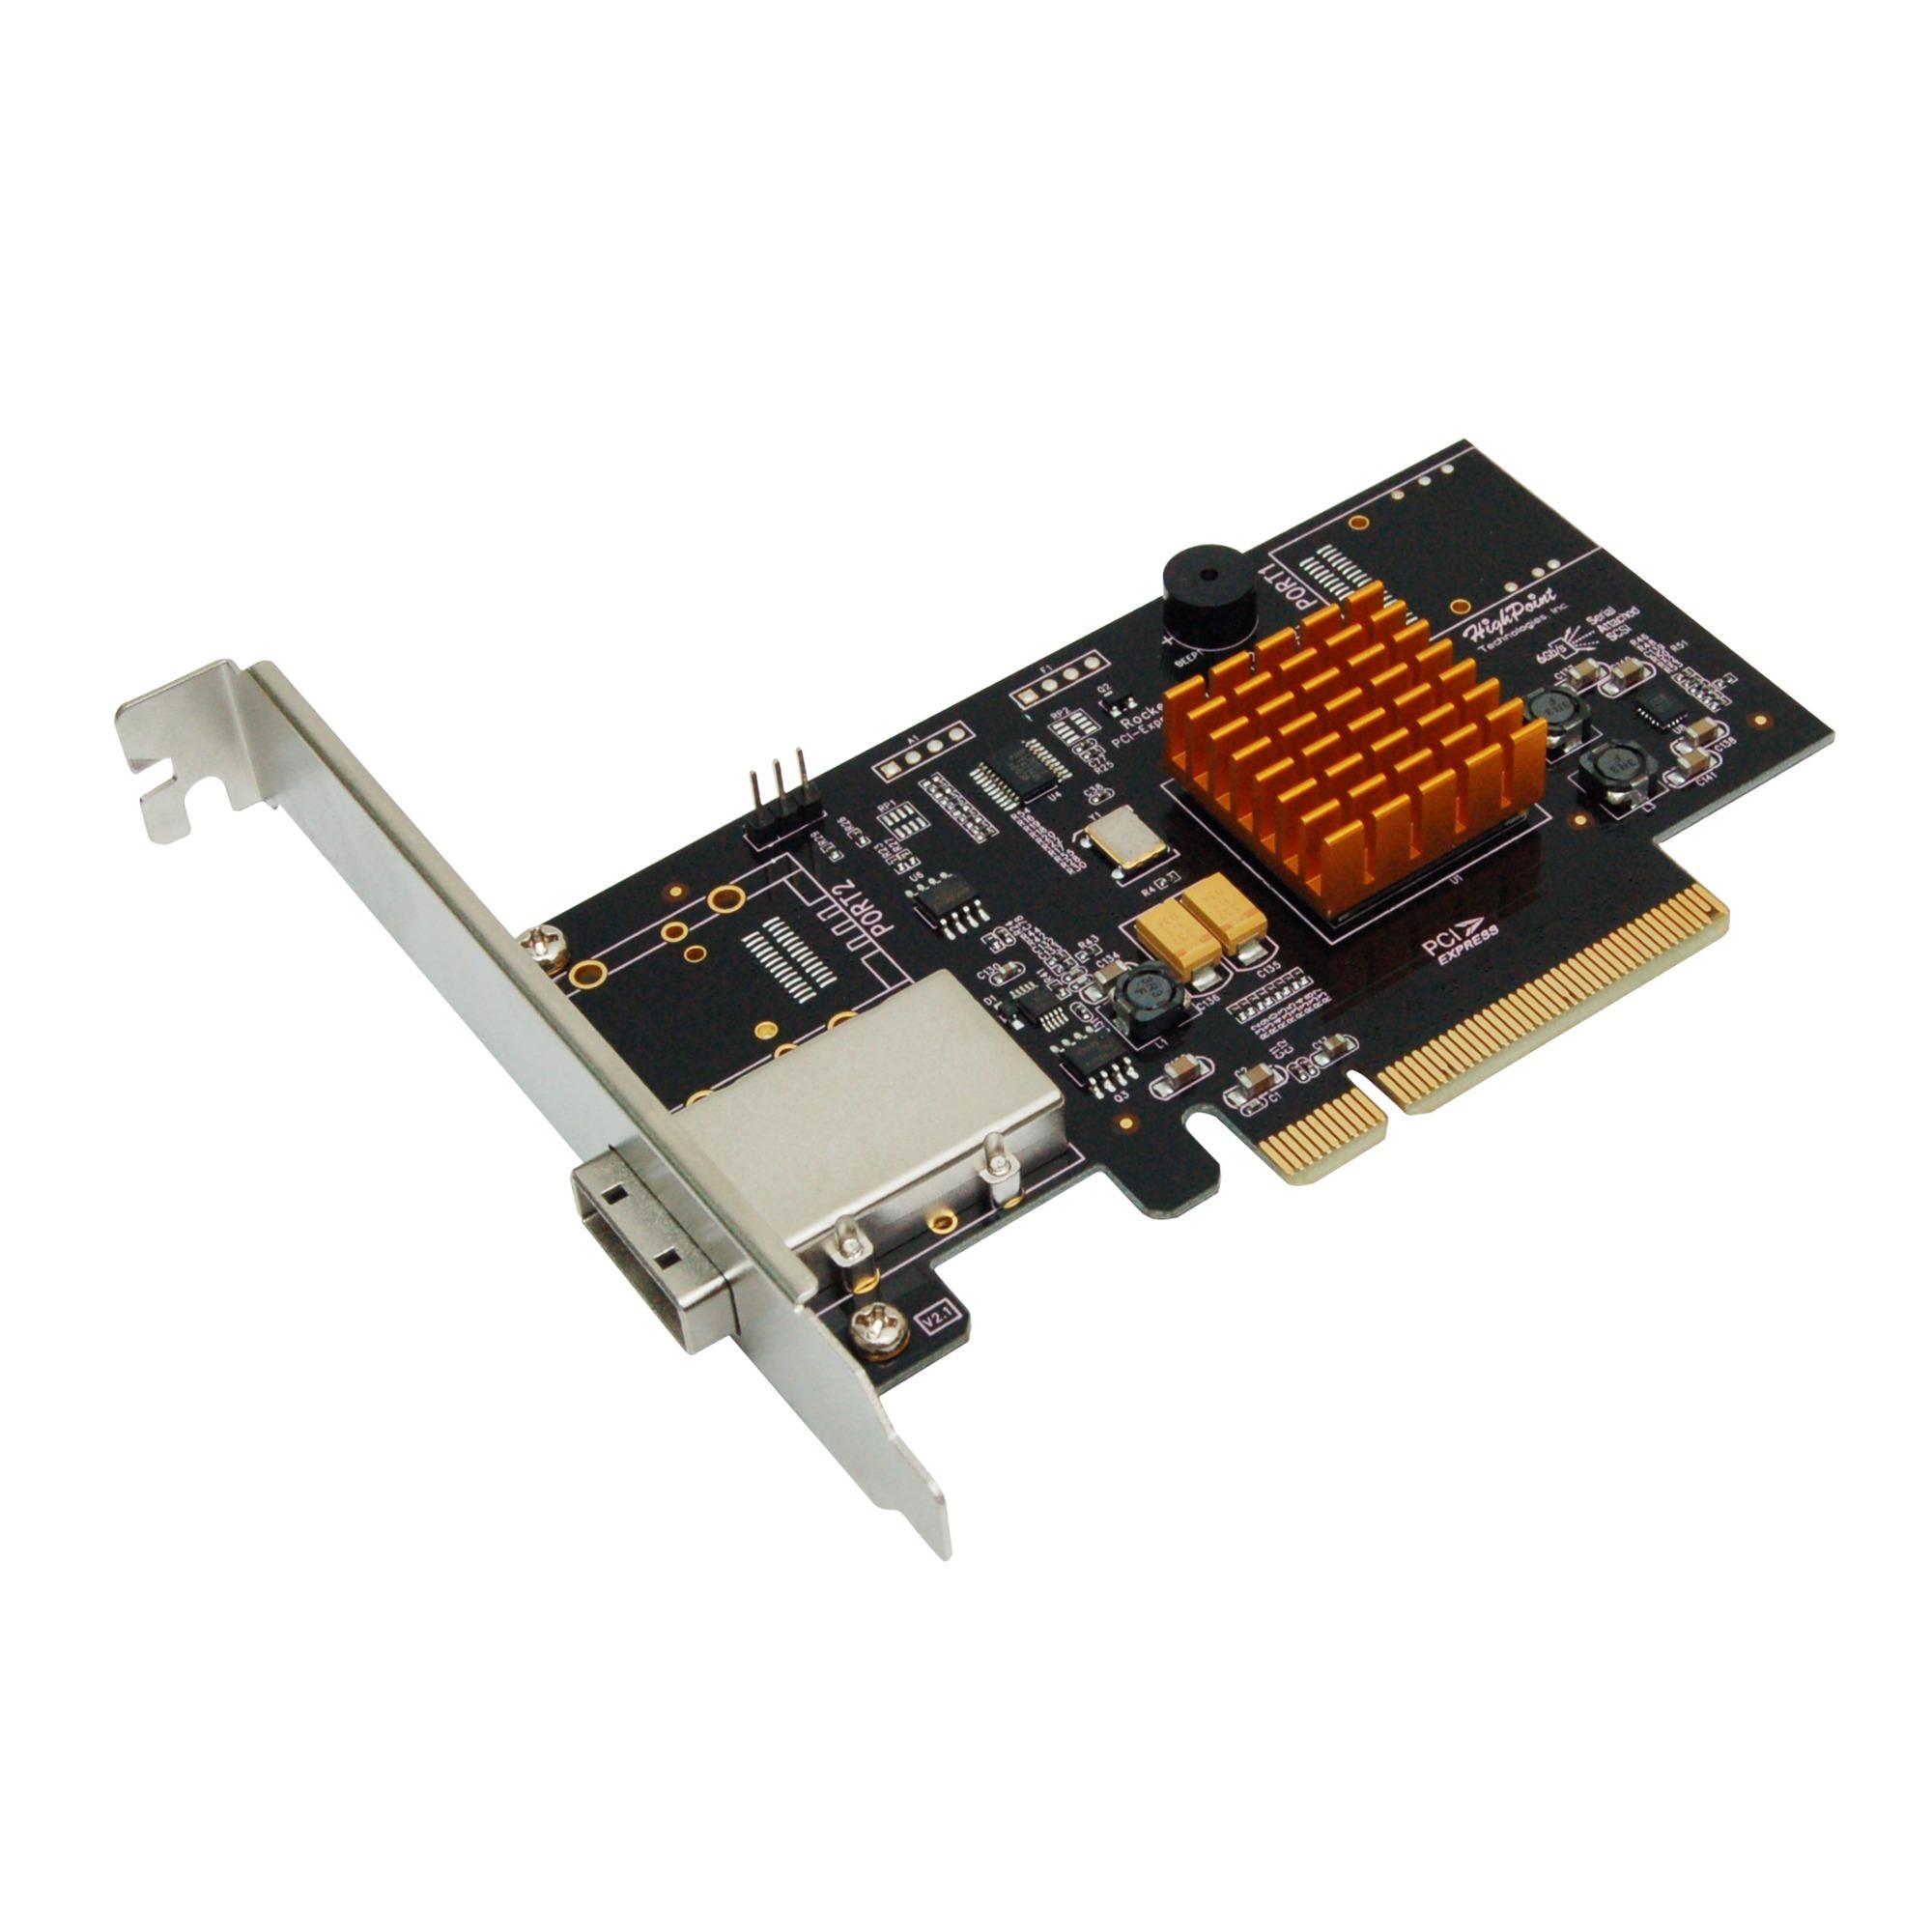 rocketraid-2711-intern-mini-sas-interface-kort-og-adapter-controller